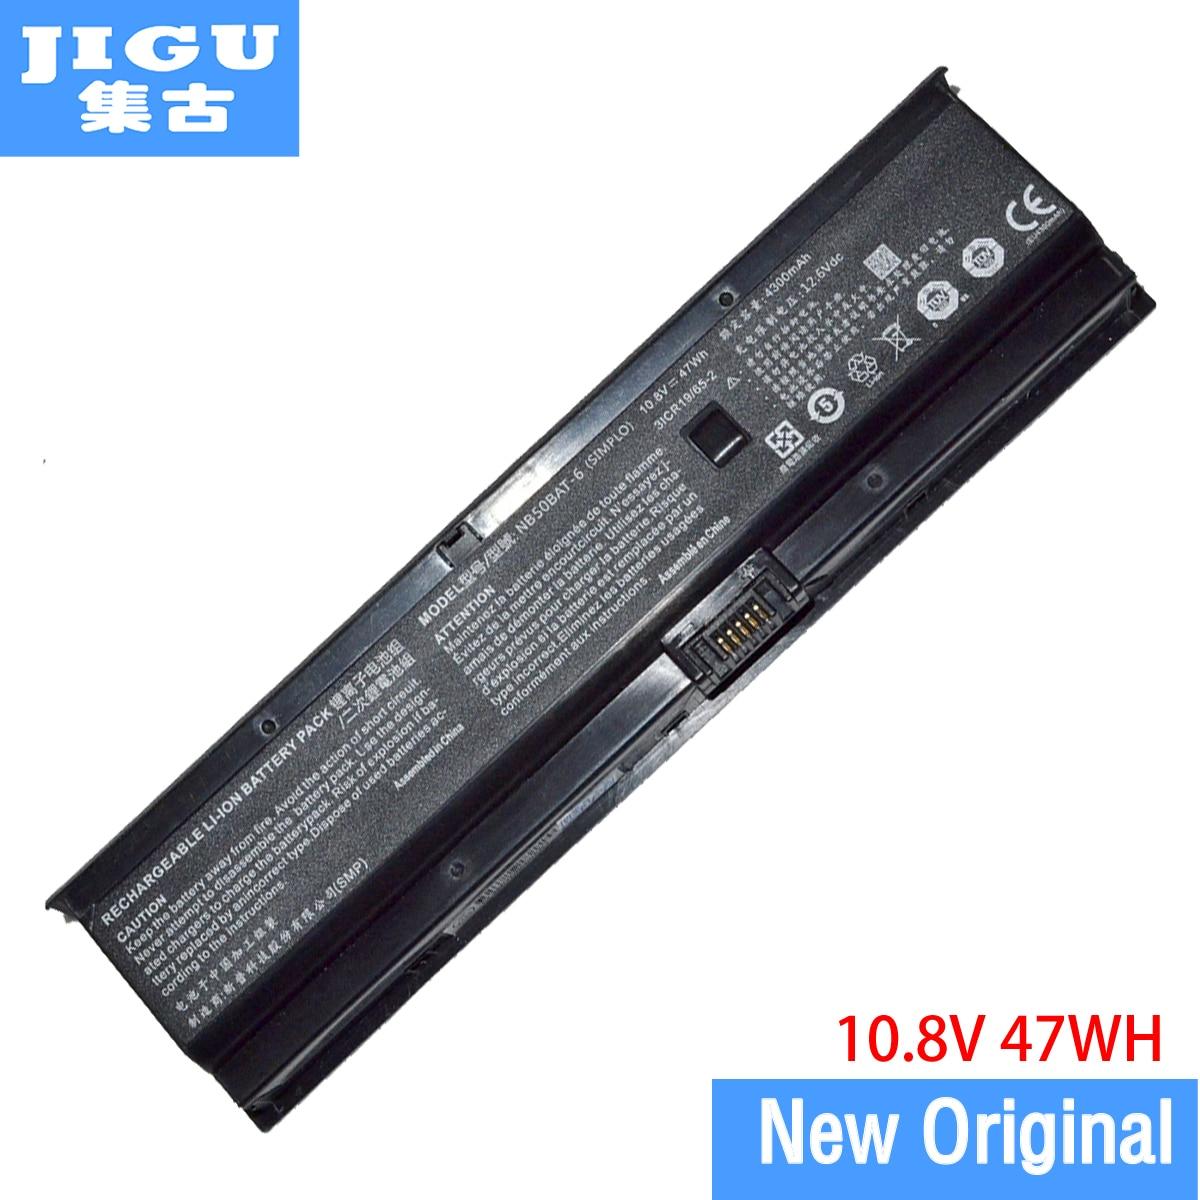 JIGU الأصلي بطارية كمبيوتر محمول NB50BAT-6 ل SHINELON HUIMIEZHE DD2 ل CLEVO NB50TJ1 NB50TL NB50TK1 10.8V 47WH